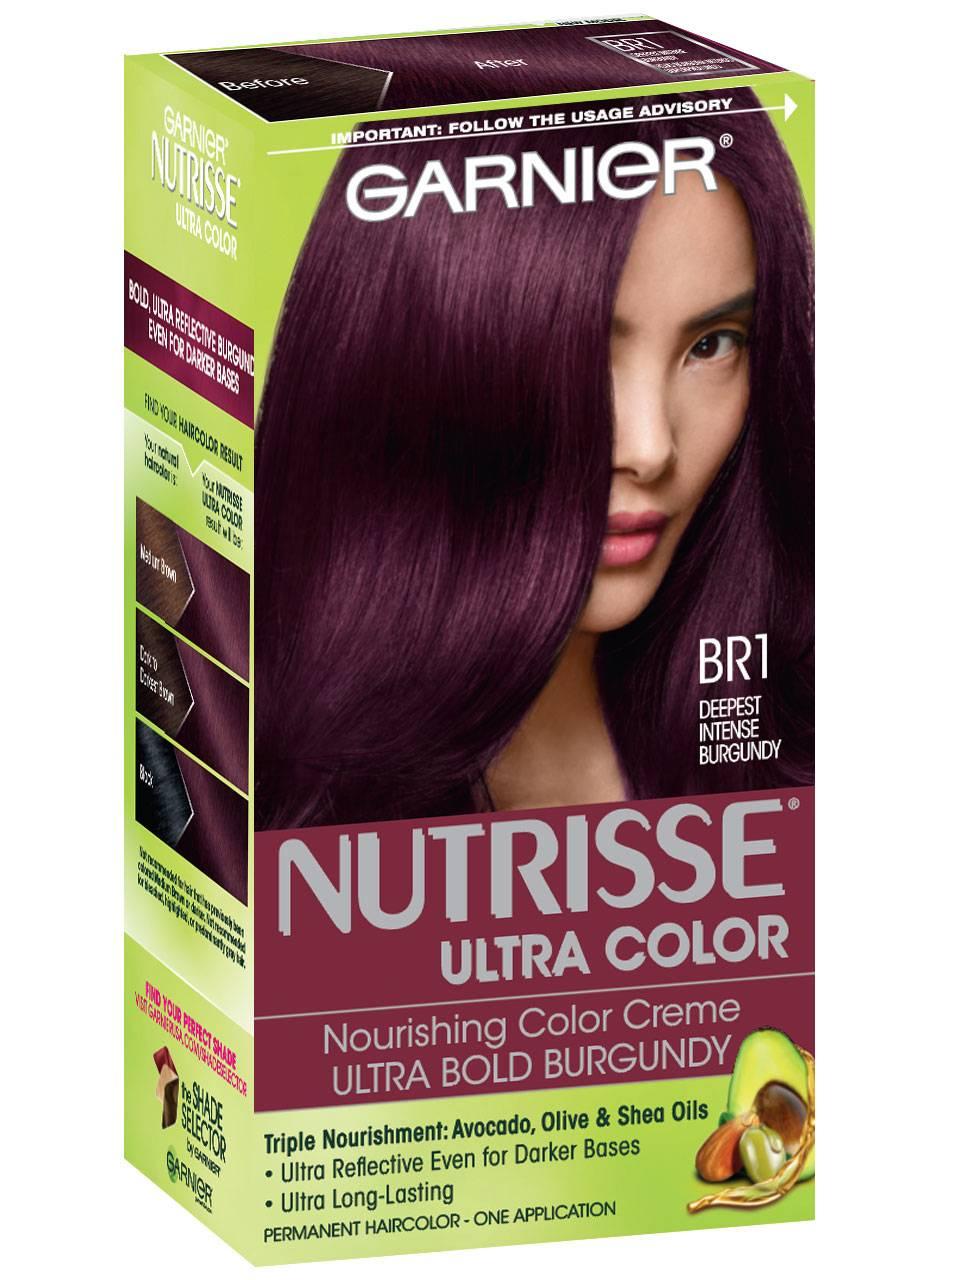 Nutrisse Ultra Color Bold Trendy Hair Color For Dark Hair Garnier